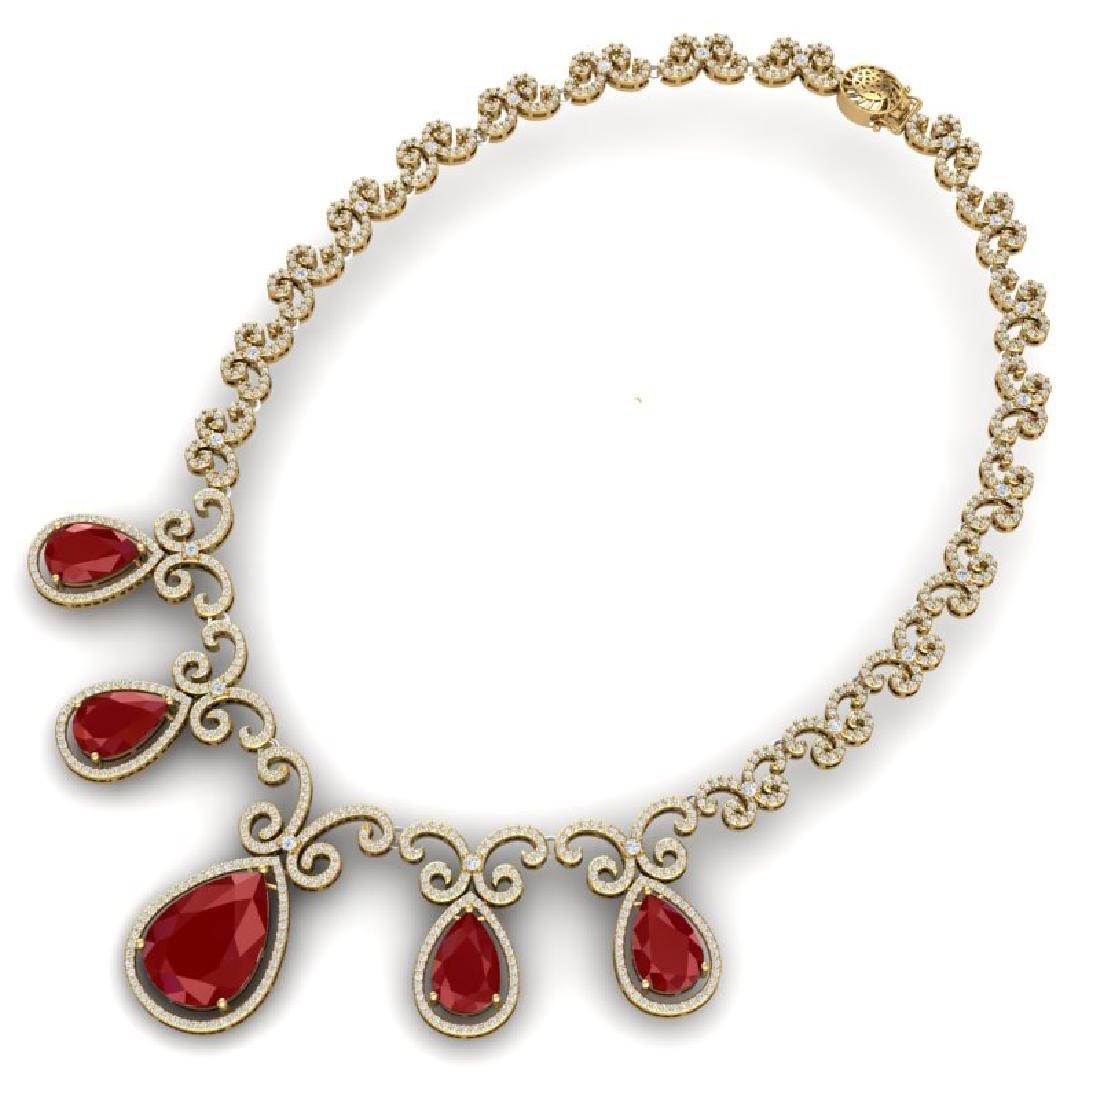 38.42 CTW Royalty Ruby & VS Diamond Necklace 18K Yellow - 2